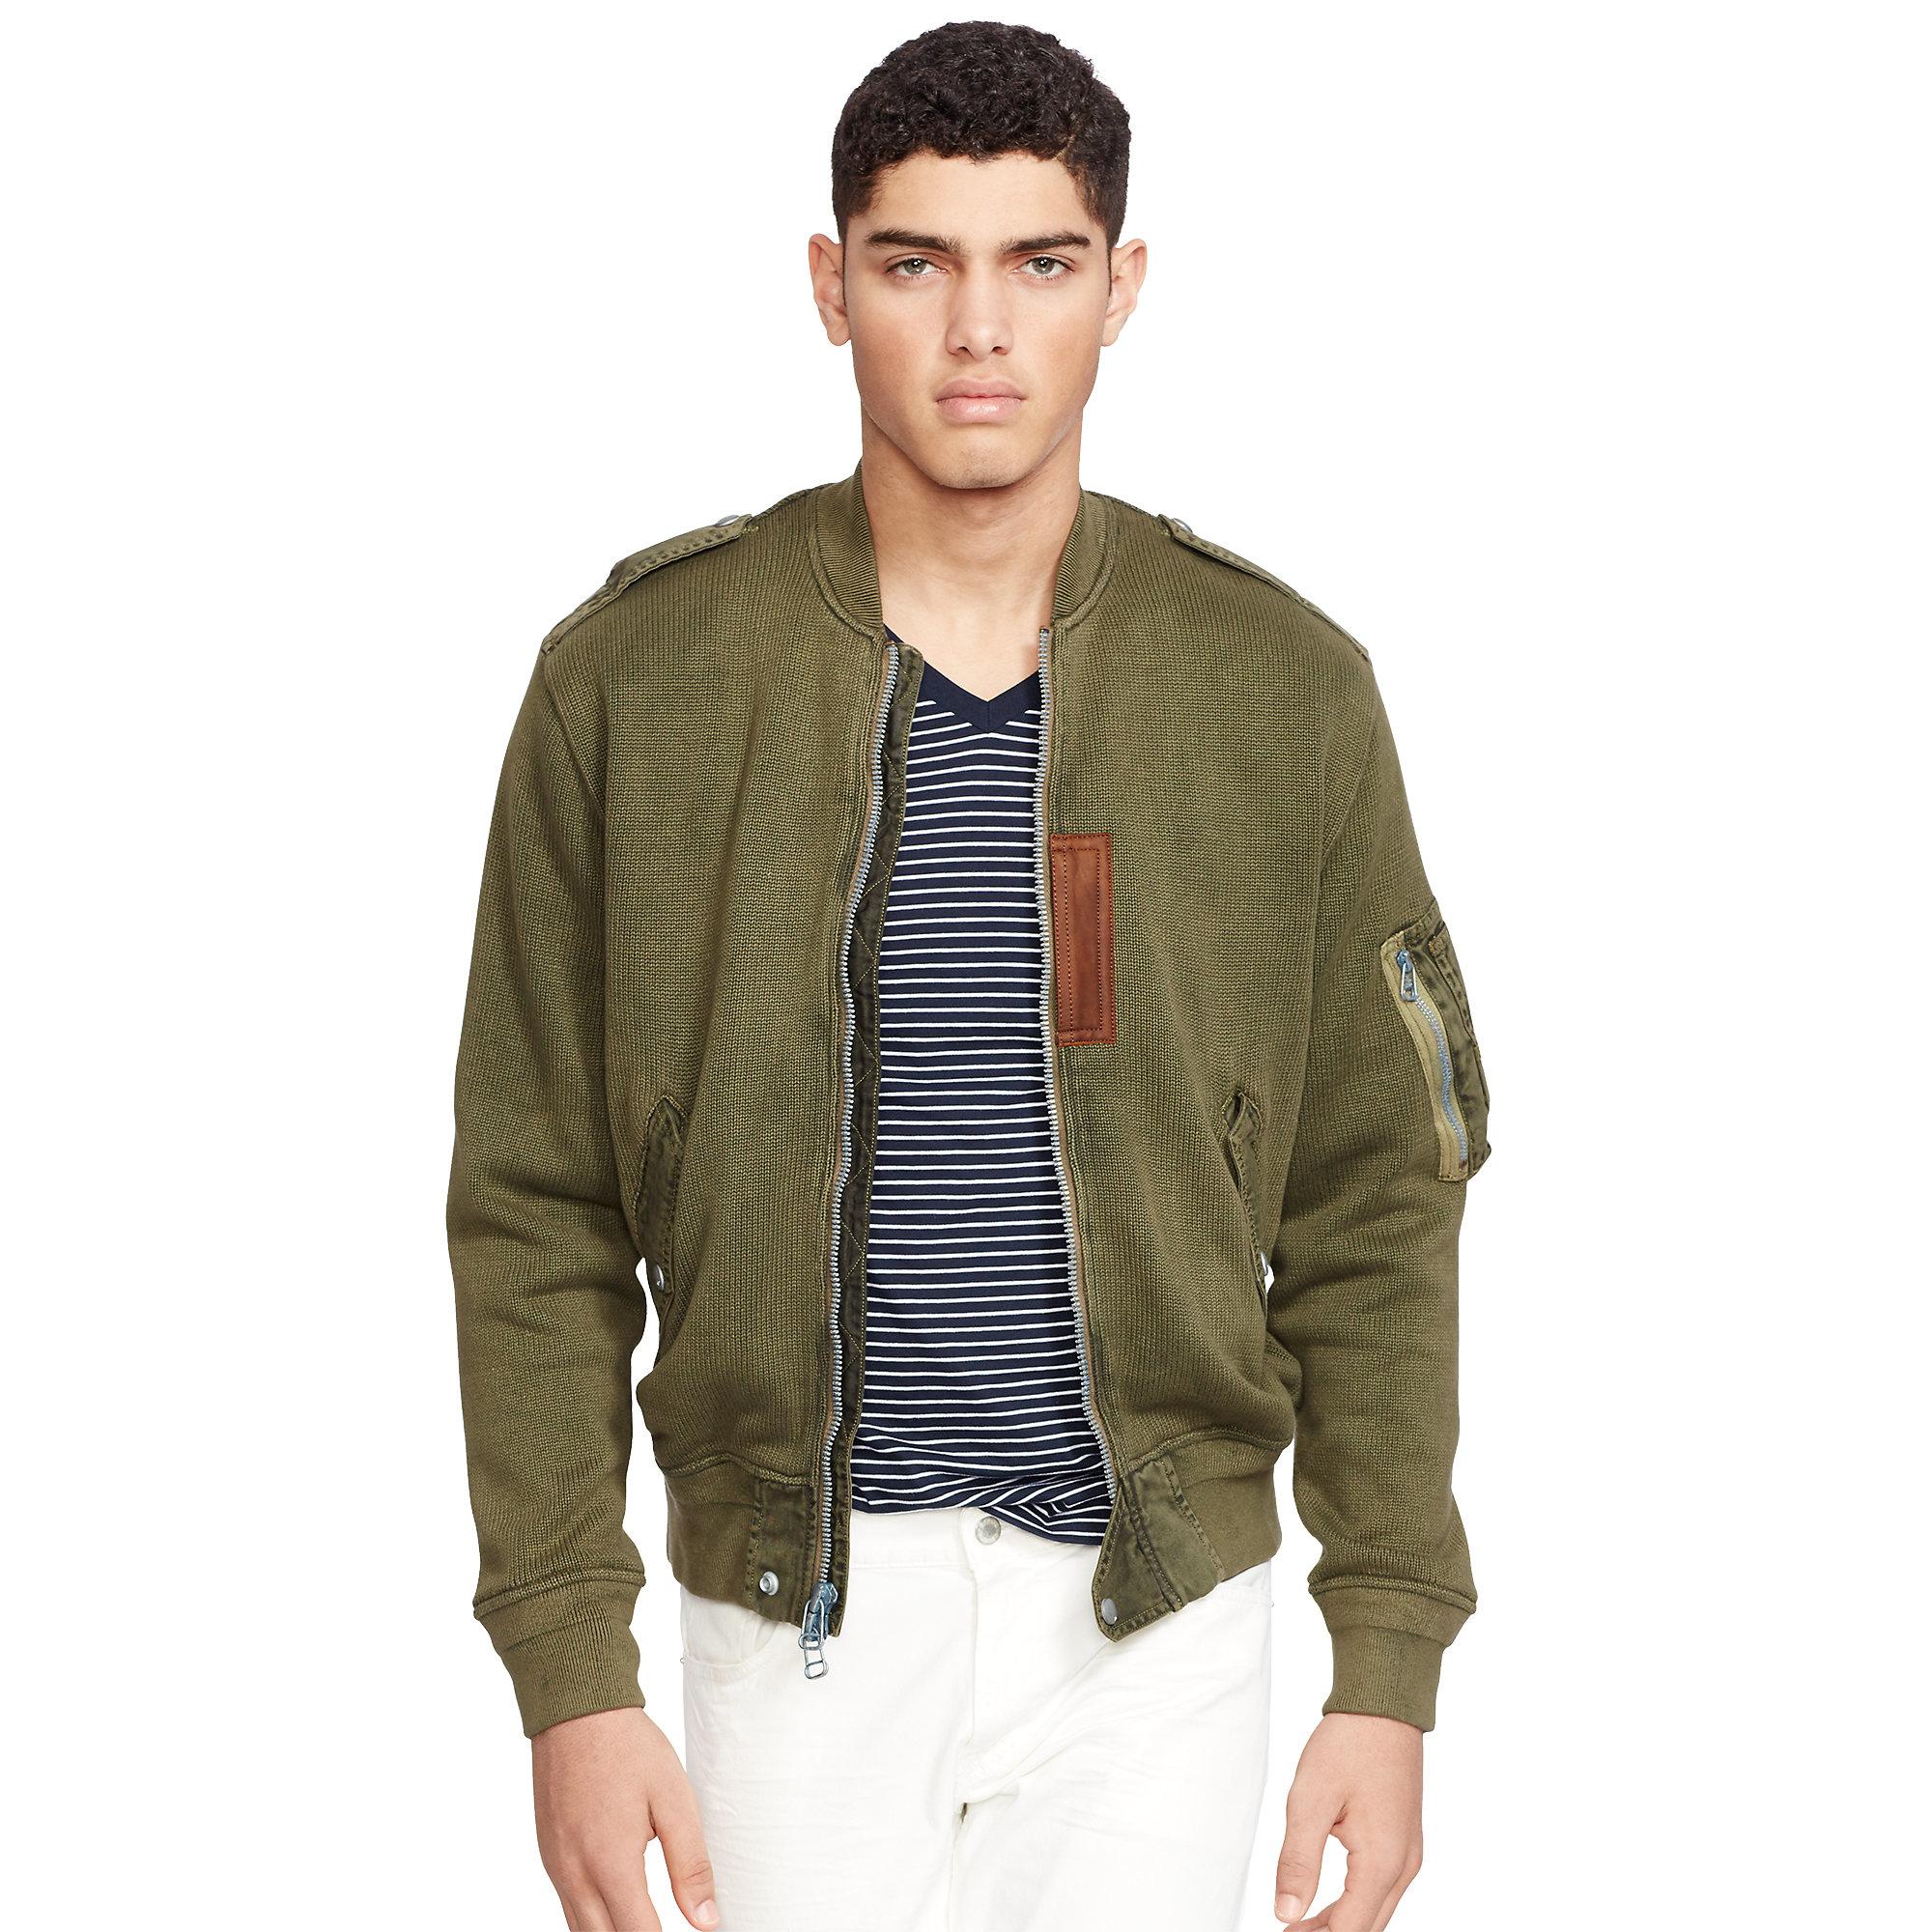 101653319 Polo Ralph Lauren Cotton Sweater Jacket in Green for Men - Lyst